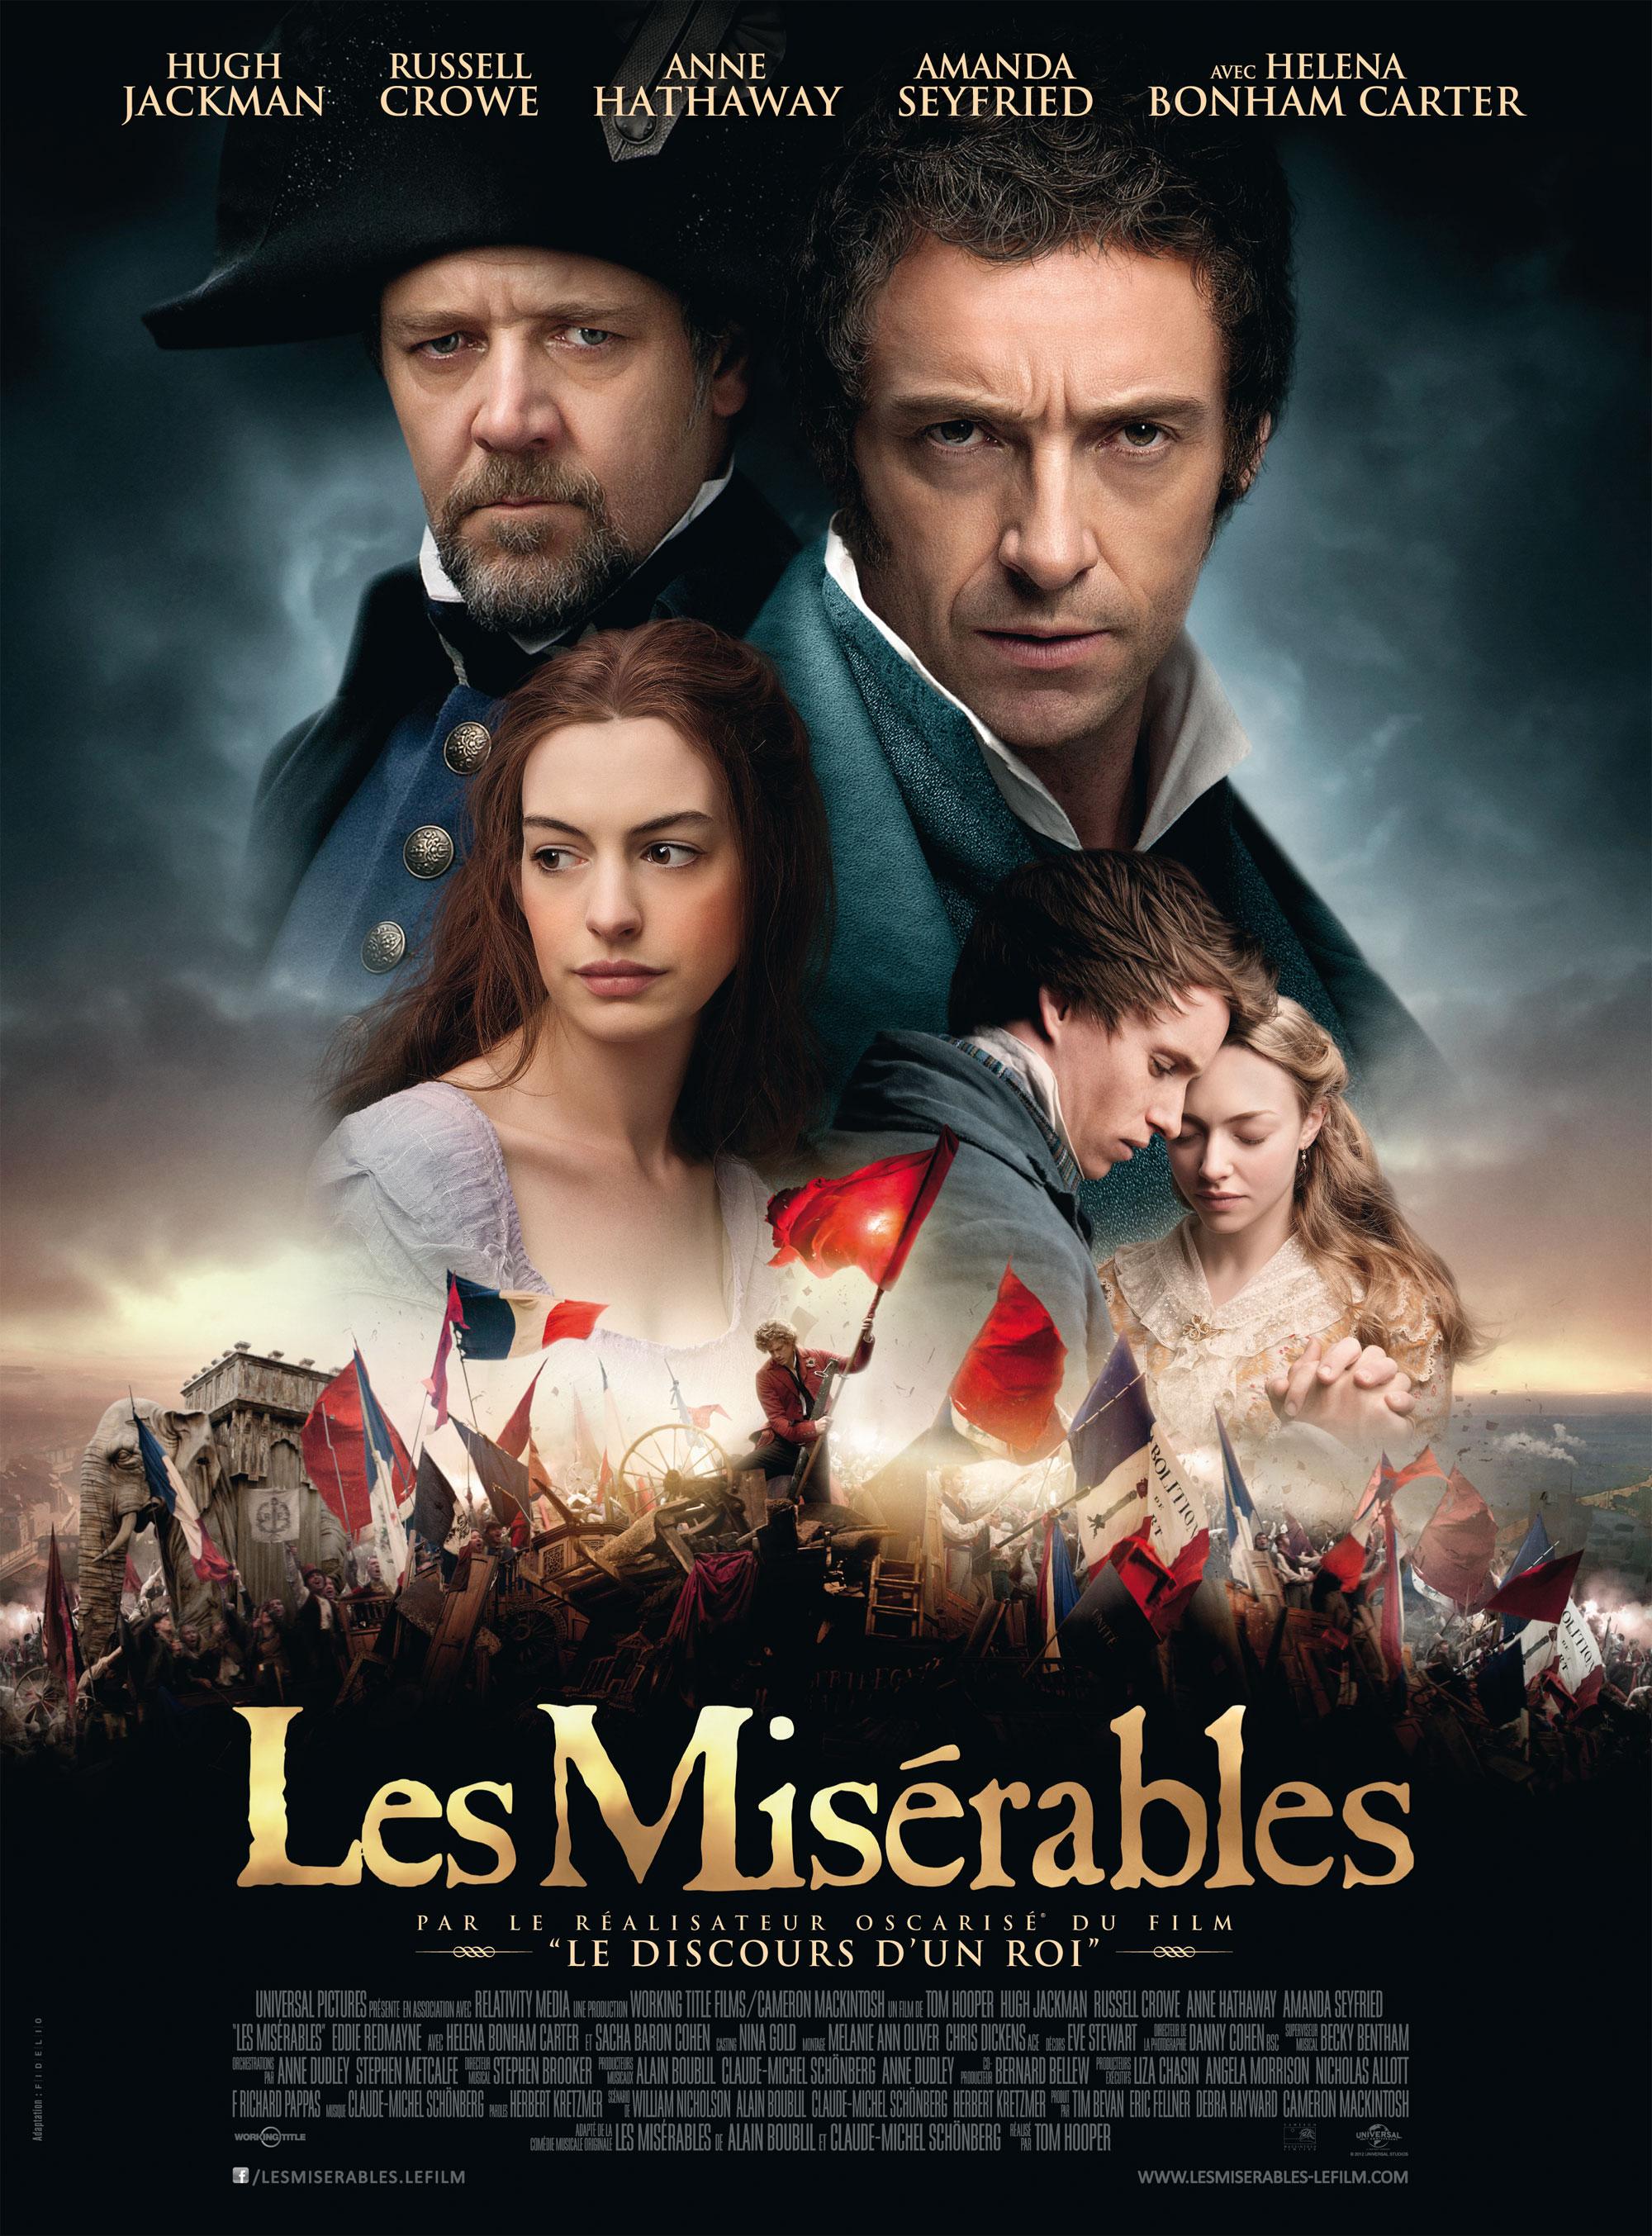 Les-Miserables-International-Poster